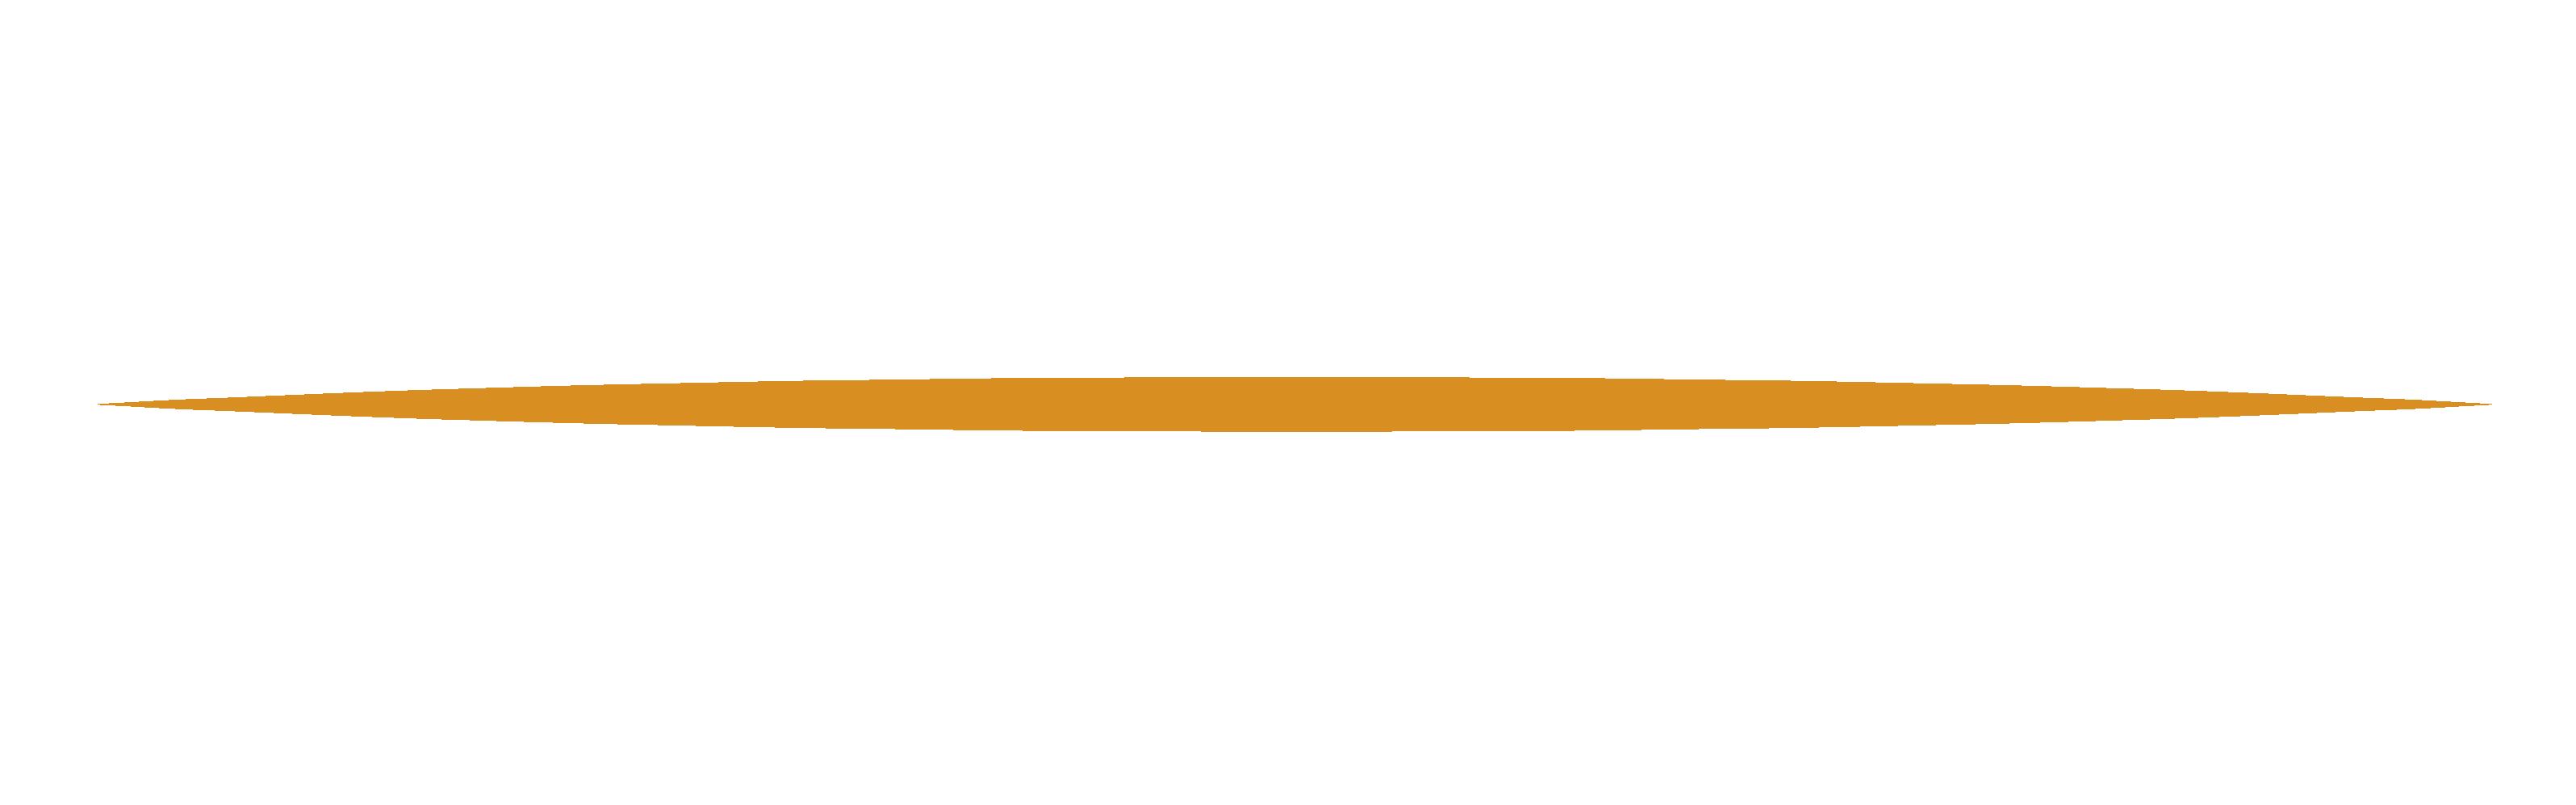 Savoneragreen